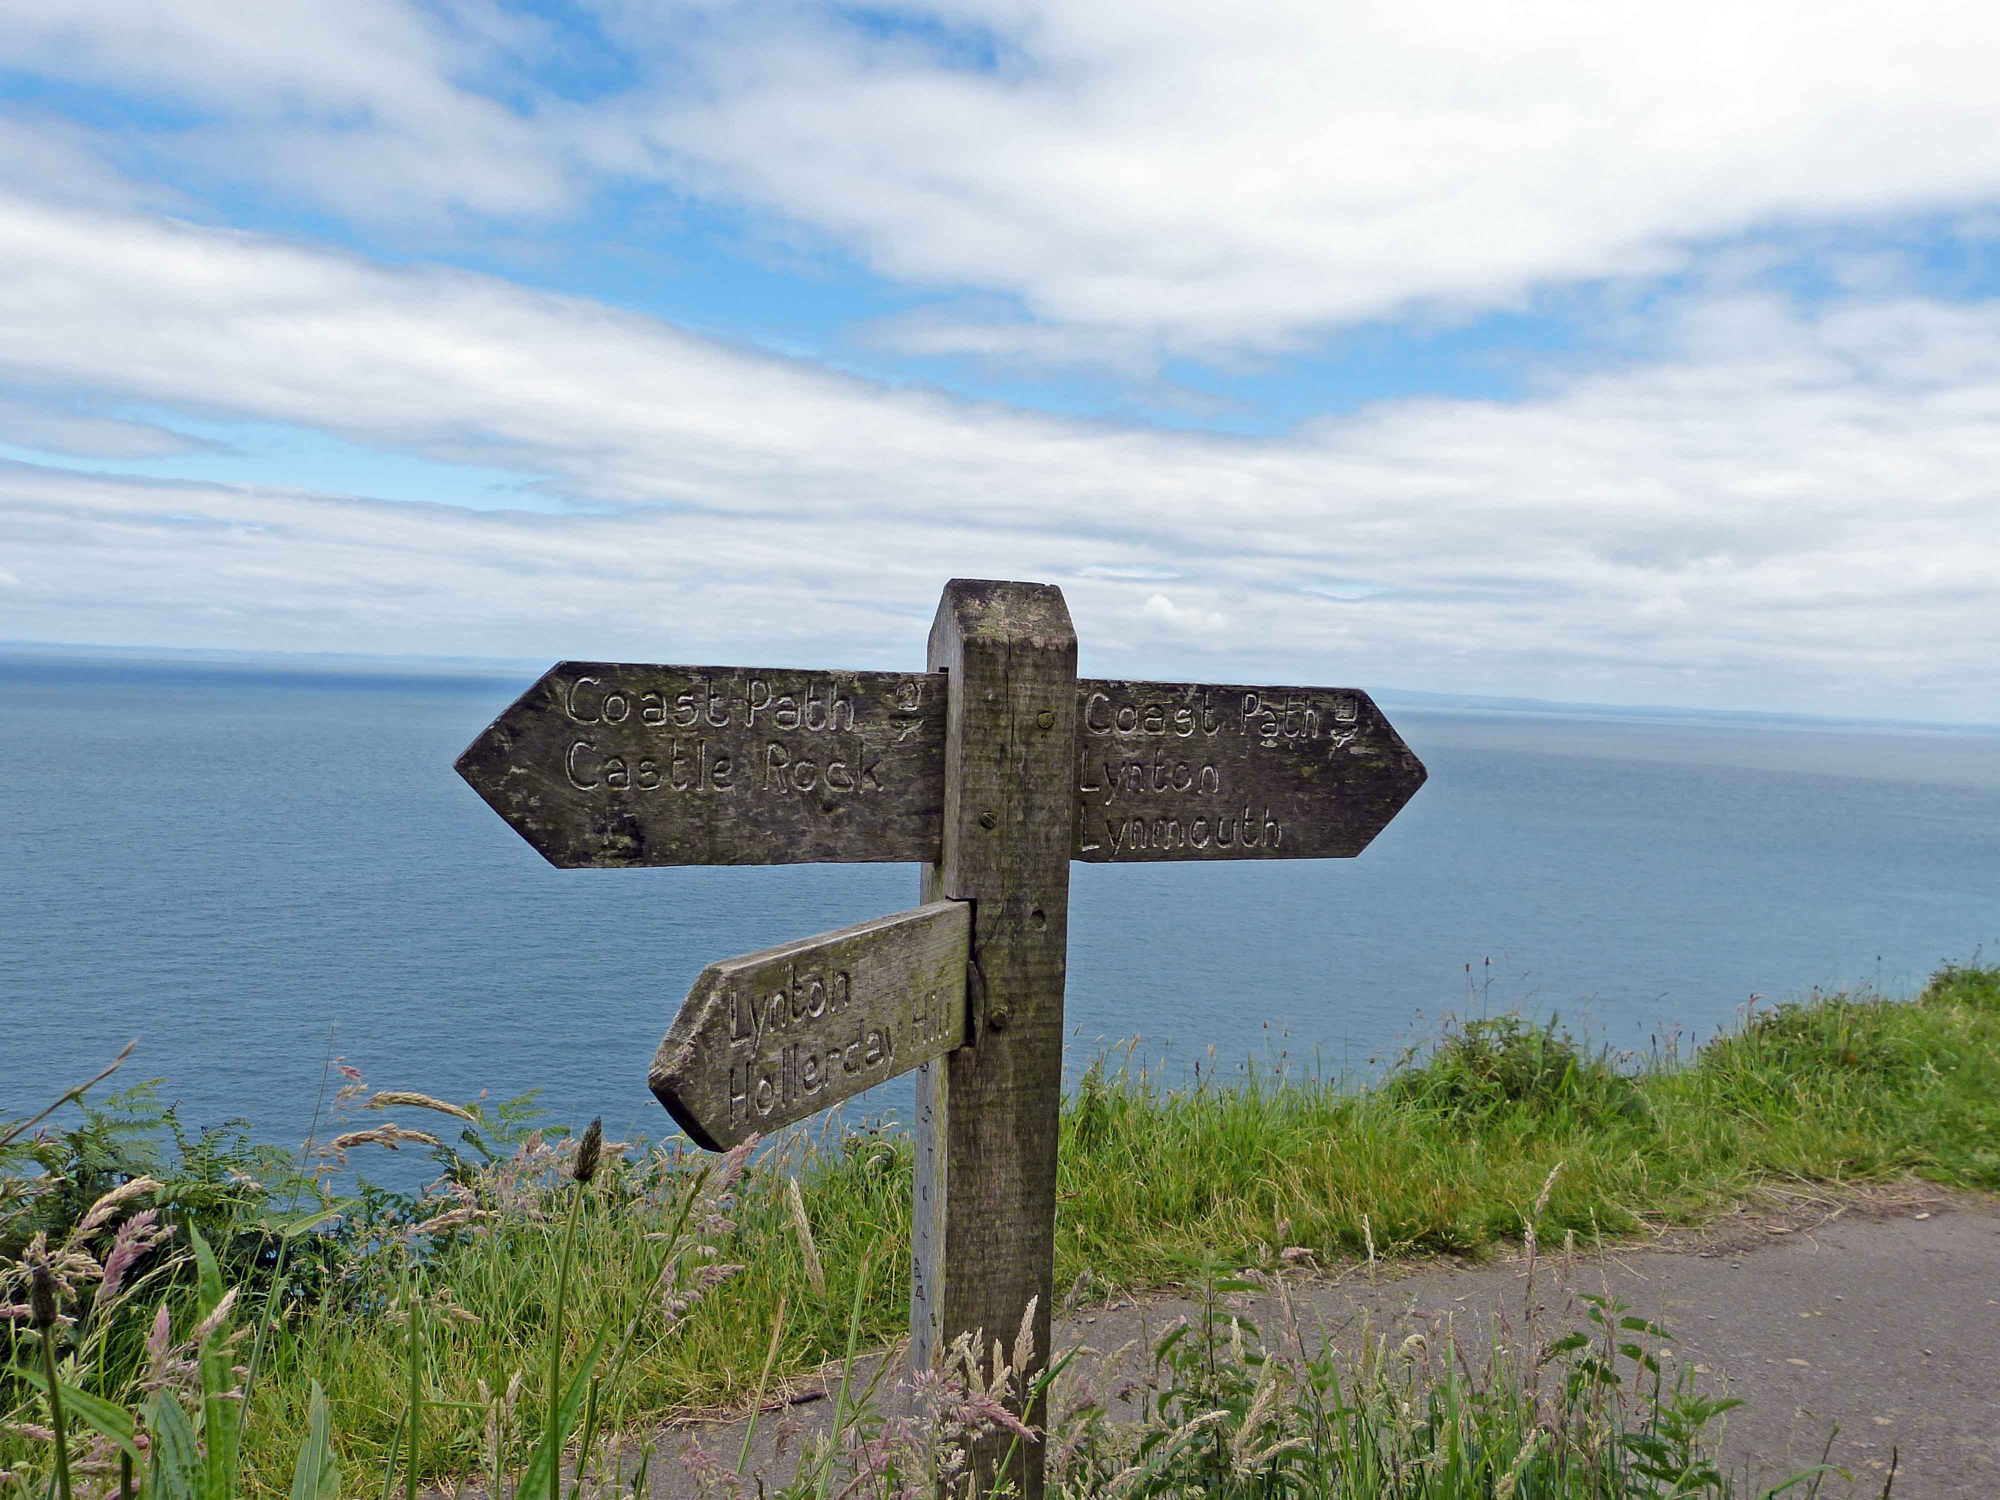 Exmoor Wanderung South west coast path